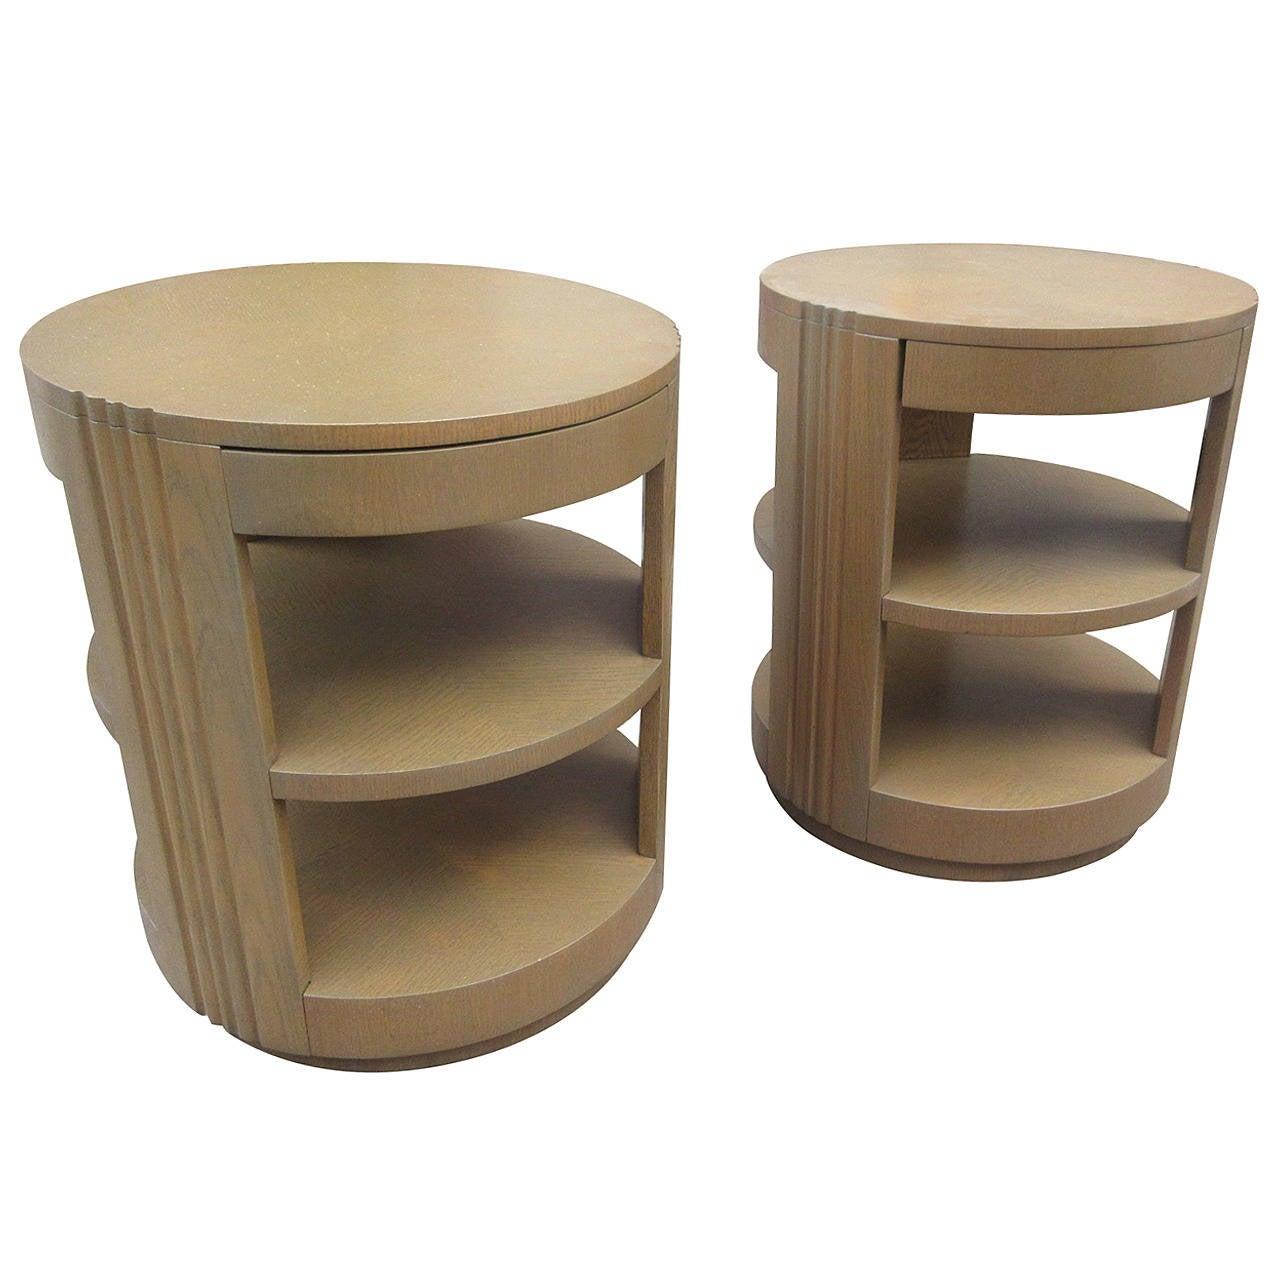 Modernage Furniture - valentineblog.net